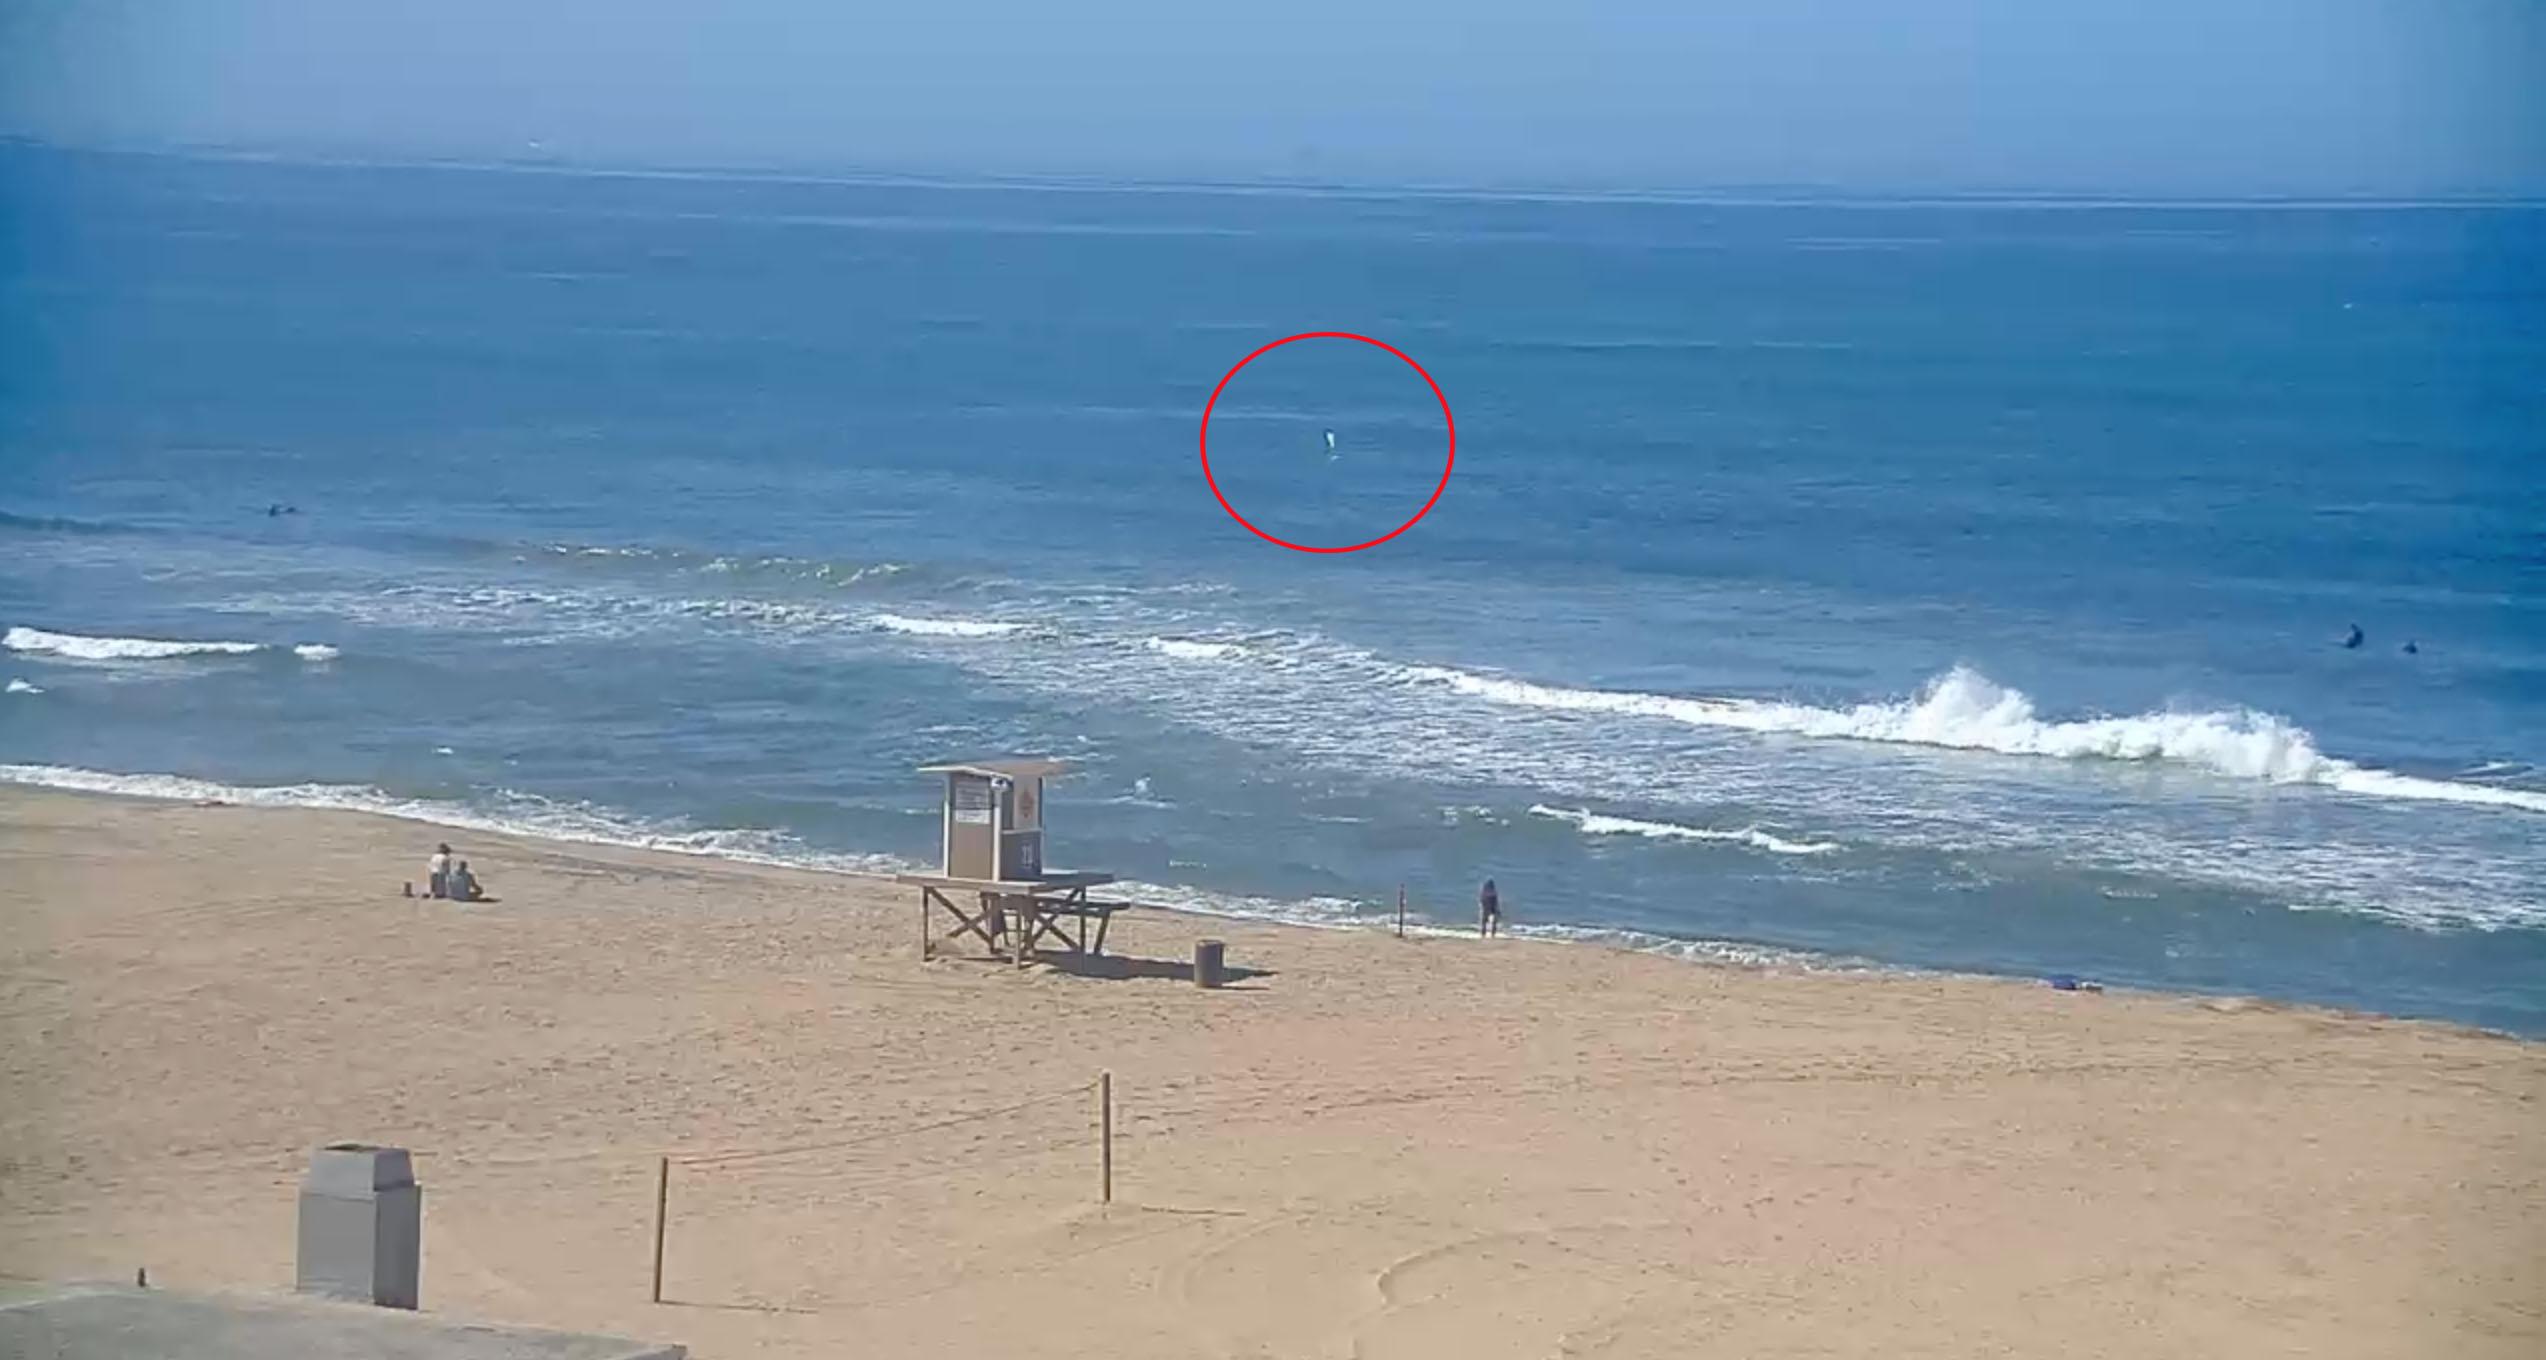 Watch: Juvenile Shark Breaches in SoCal